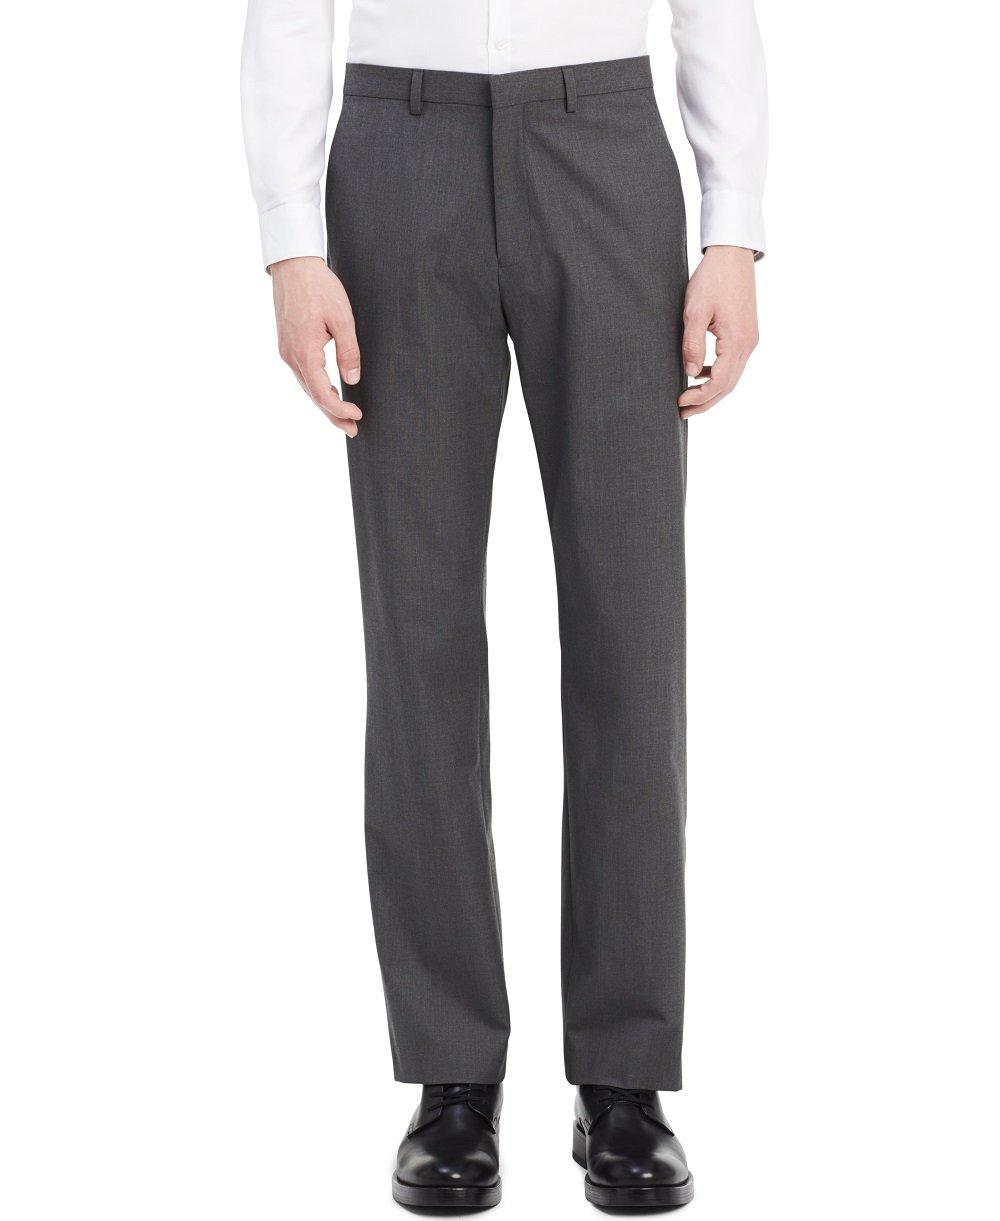 Calvin Klein Men's Infinite Slim Fit Trouser Suit Pant 4-Way Stretch, Cinder Block, 36W 30L